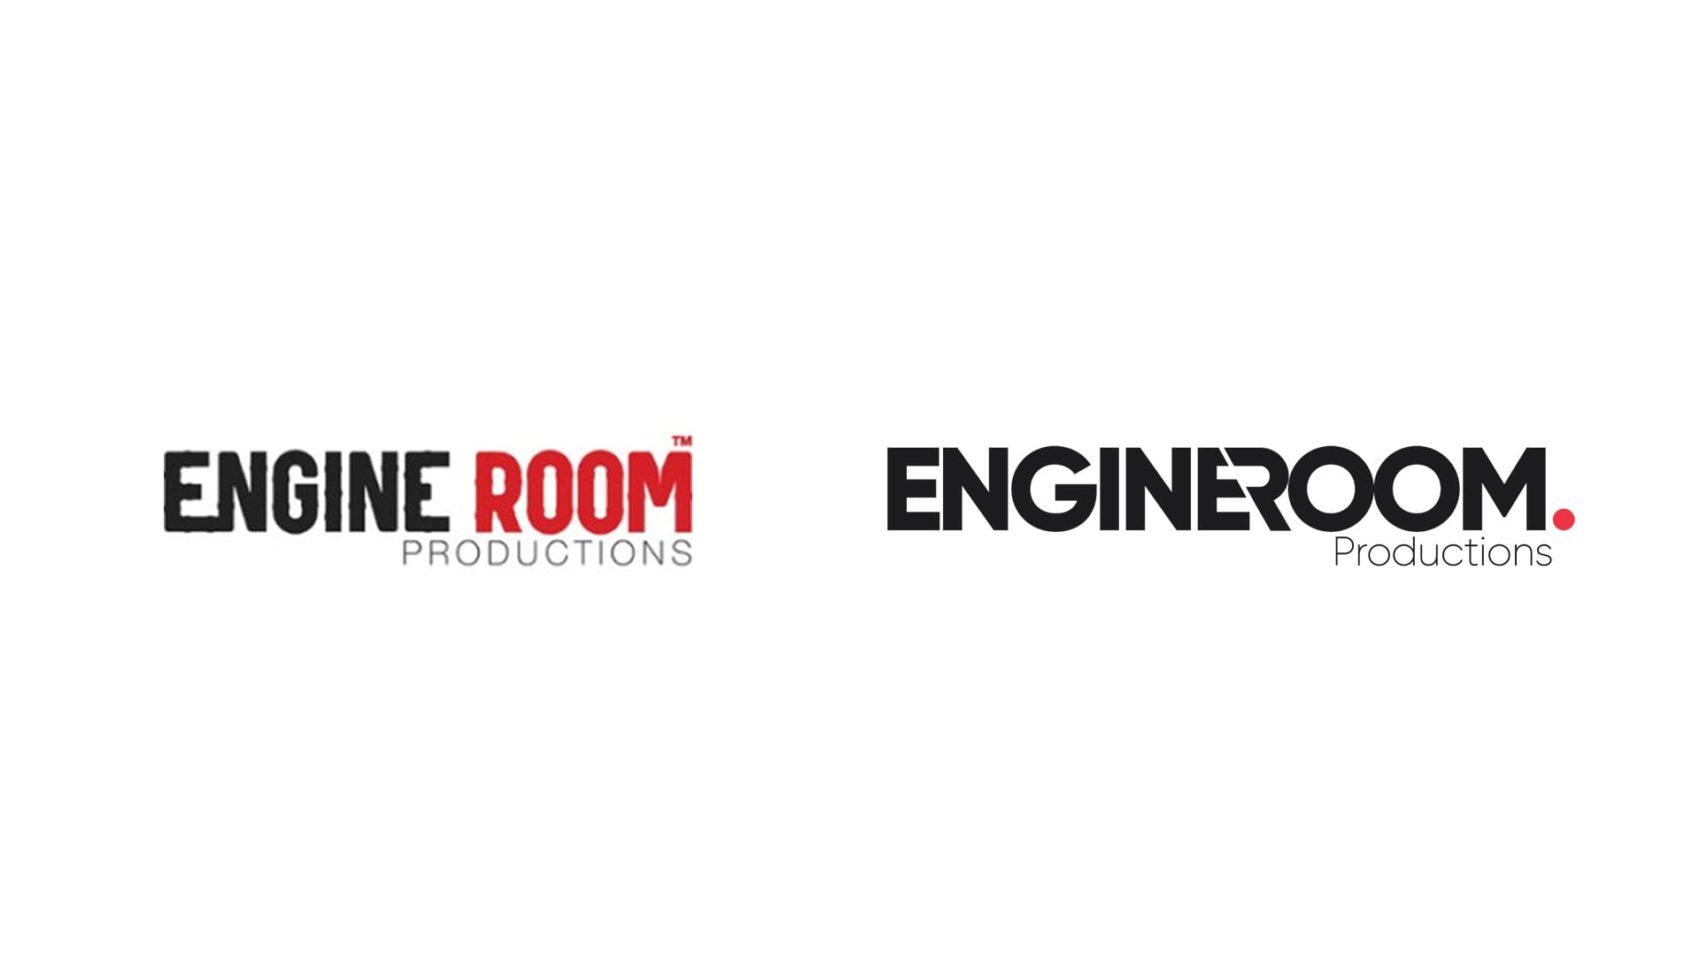 engineroom_rebrand